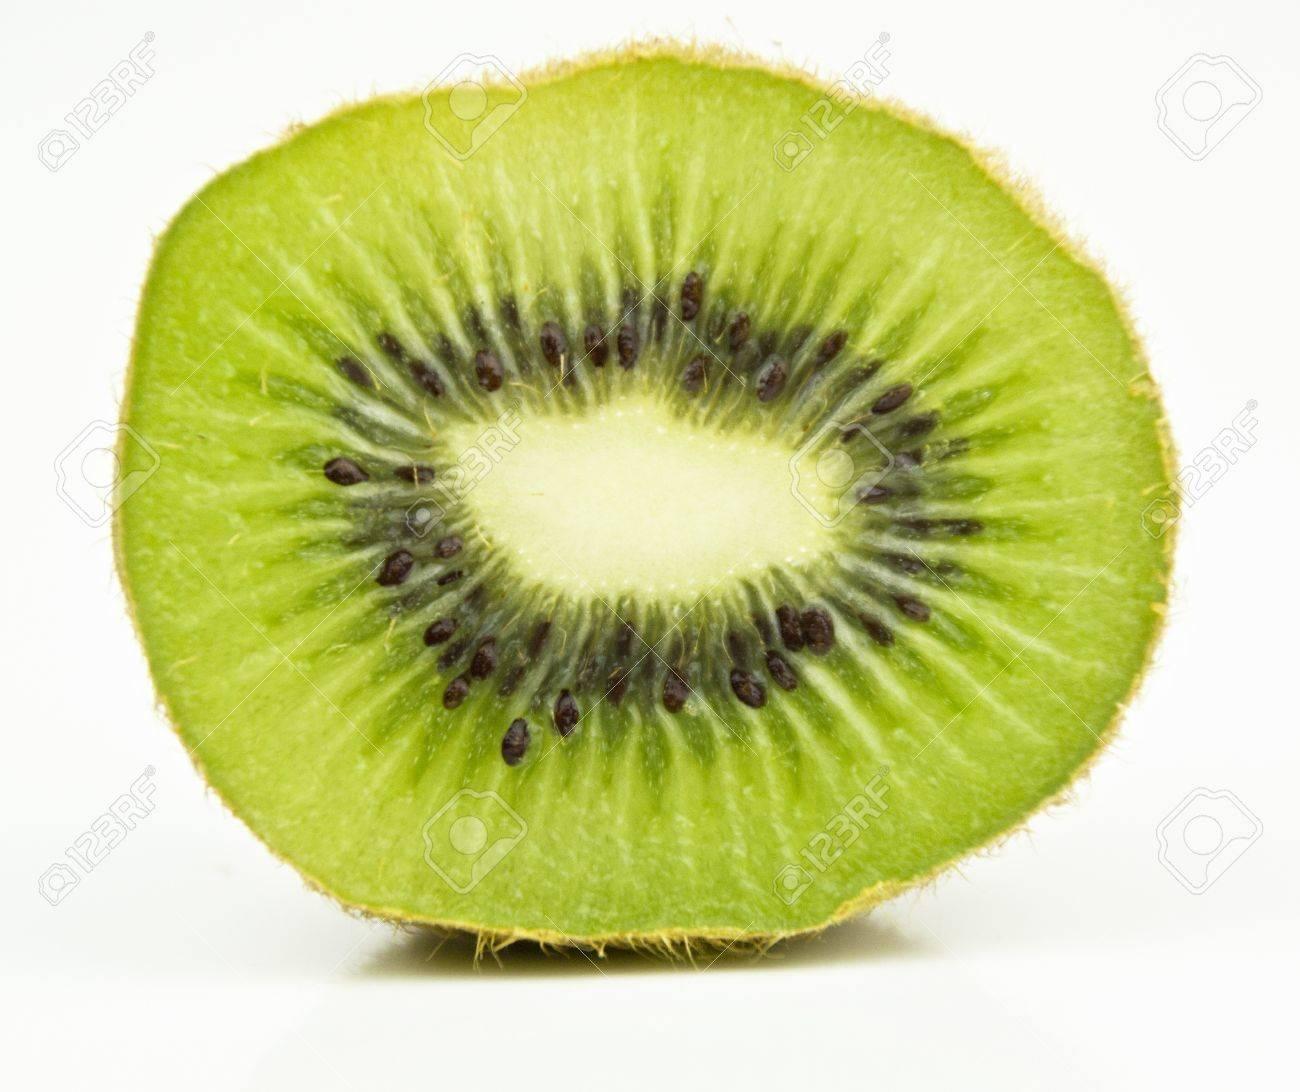 kiwi fruit cut through centre Stock Photo - 15011757